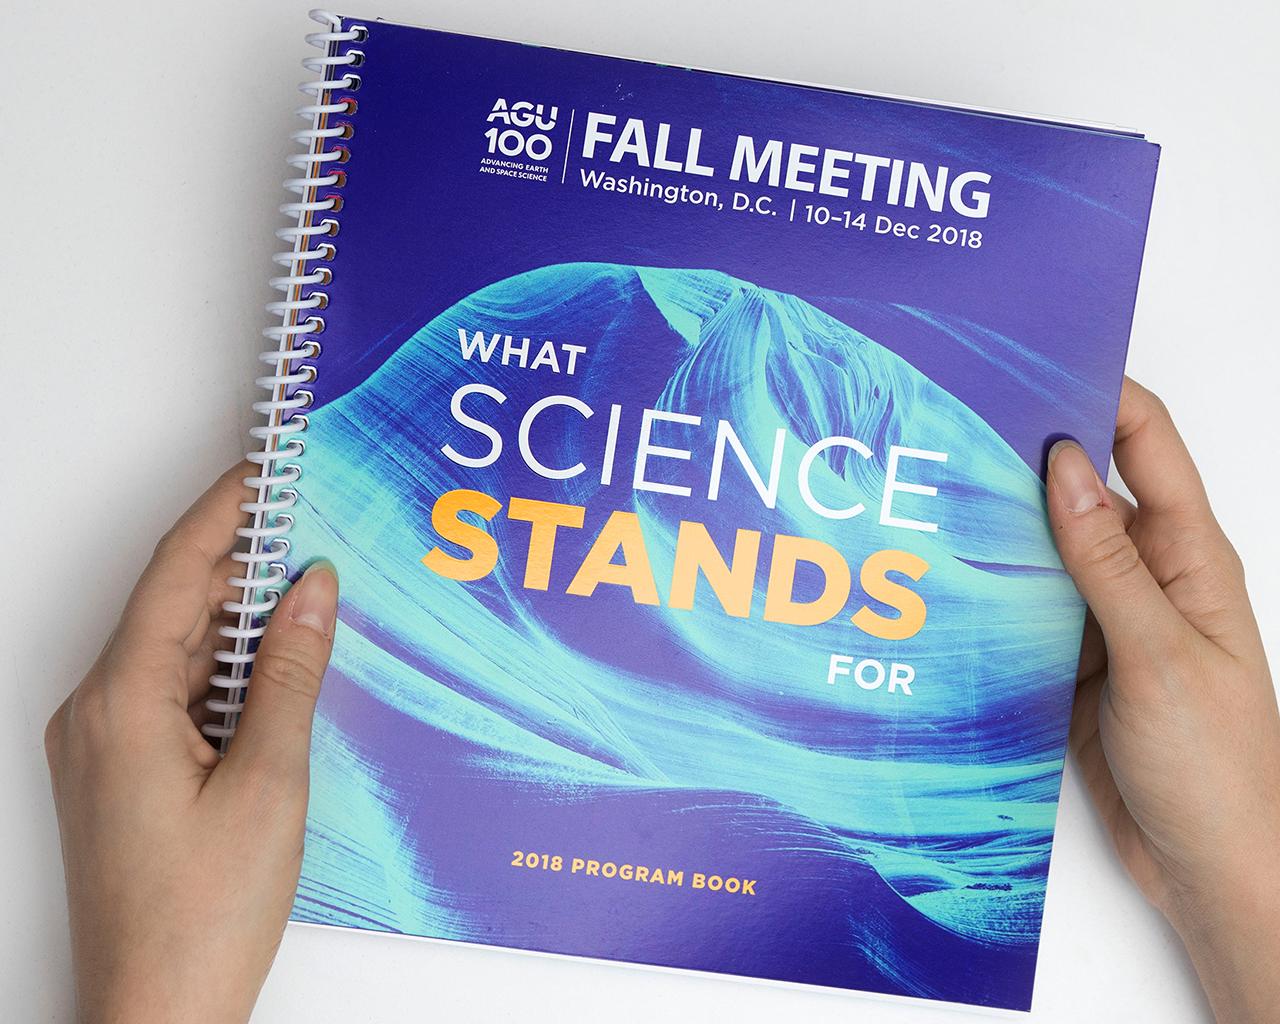 Hands holding the AGU Fall Meeting 2019 program book